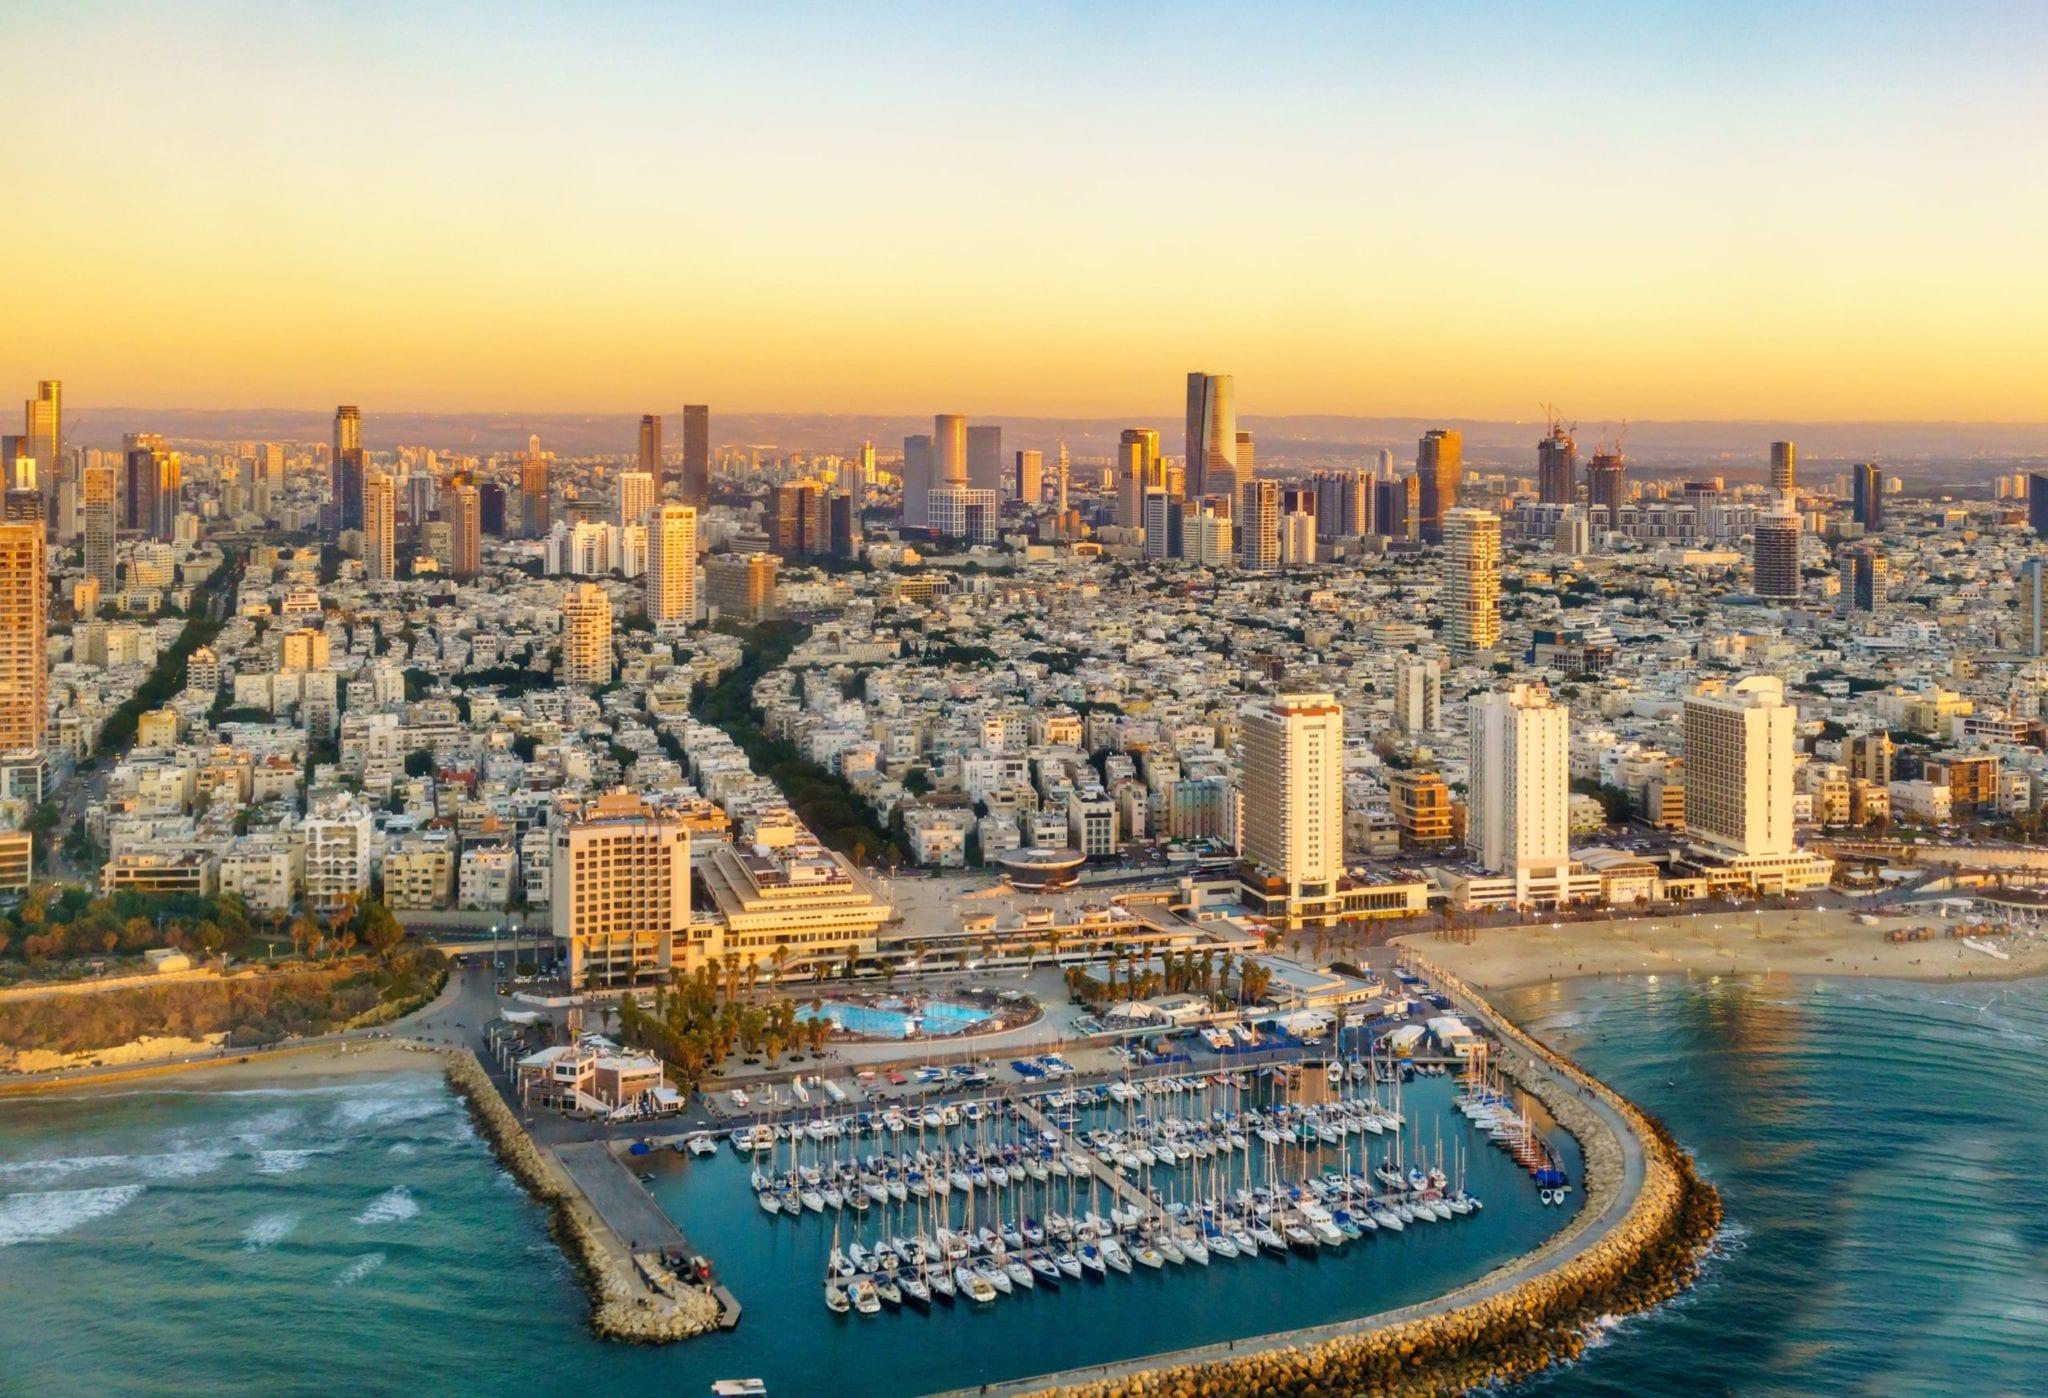 Panoramic view of the Israeli coastline